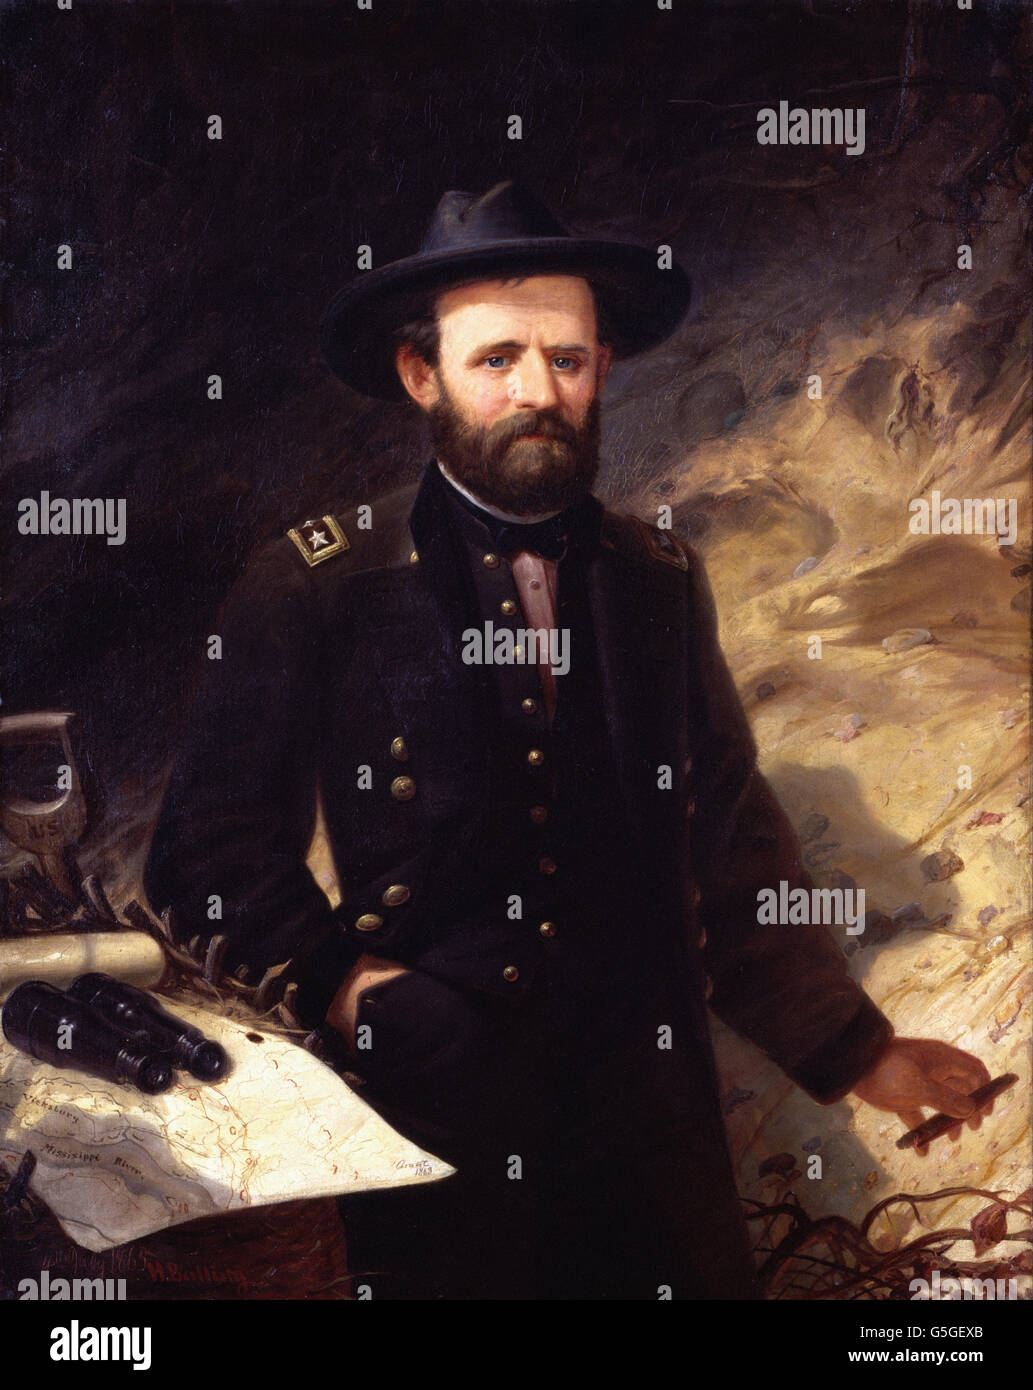 Ole Peter Hansen Balling - Ulysses S. Grant - Stock Image